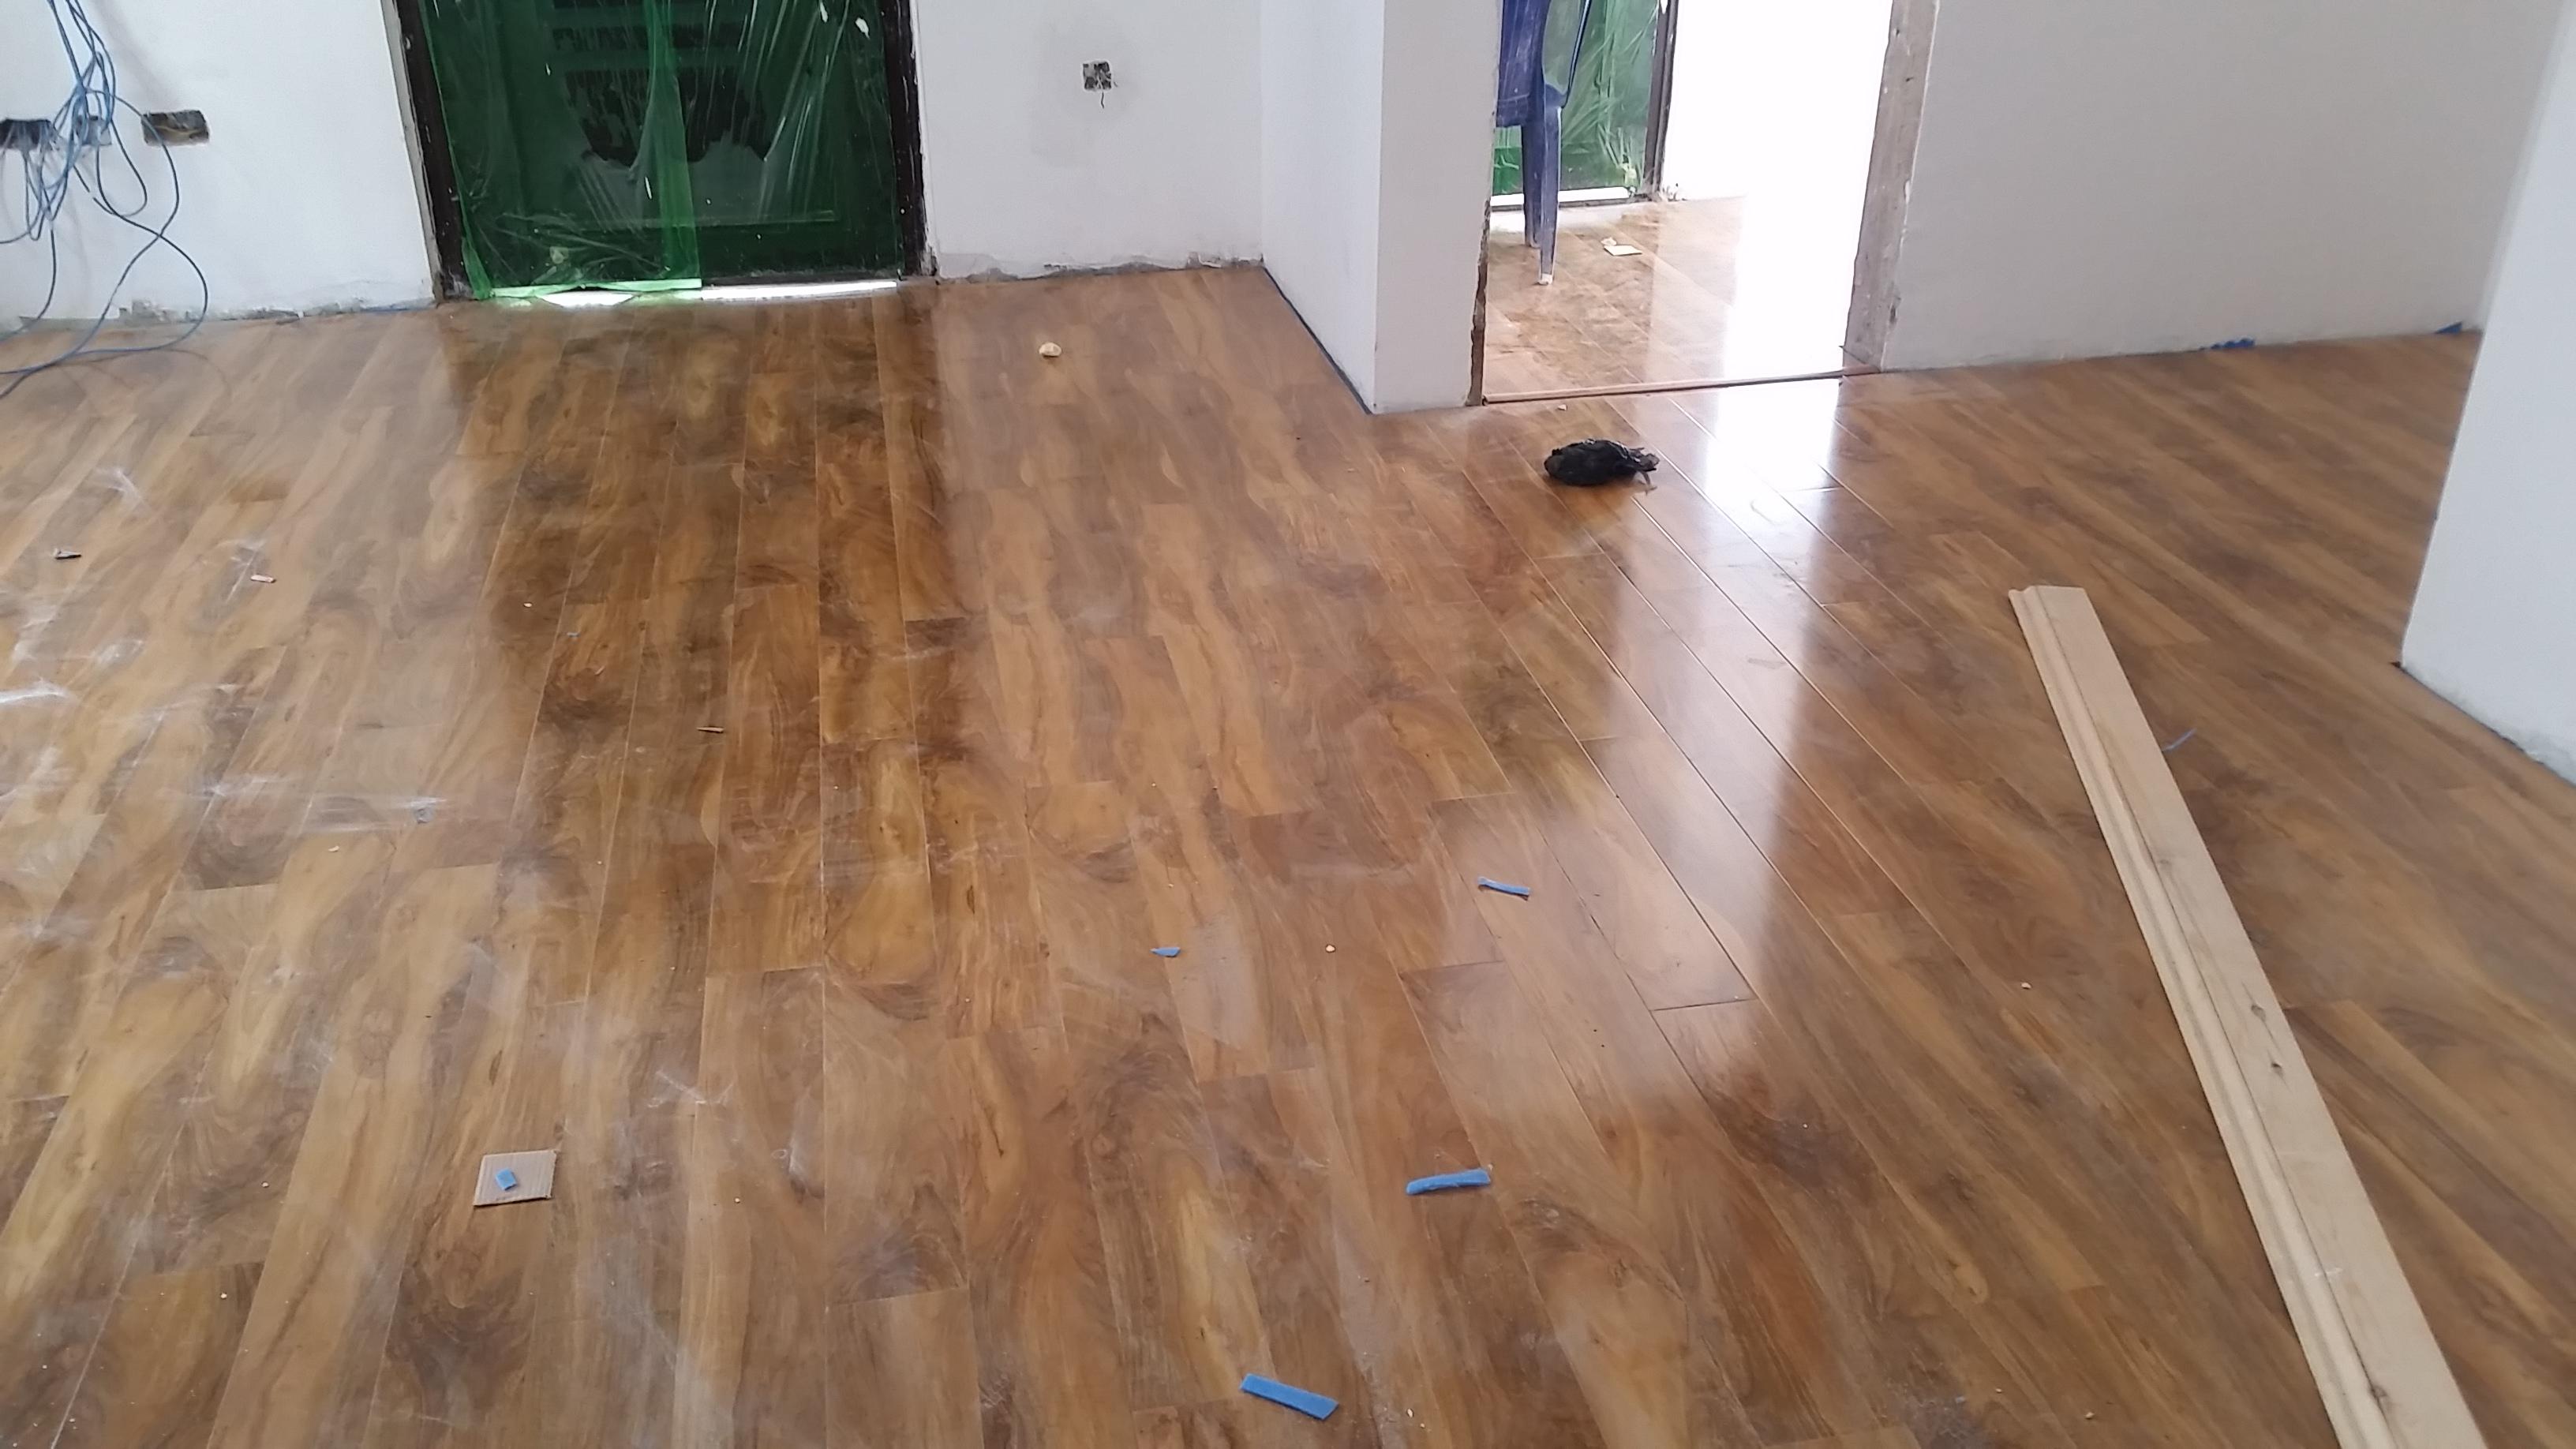 Laminated Wooden (Parquet) Flooring